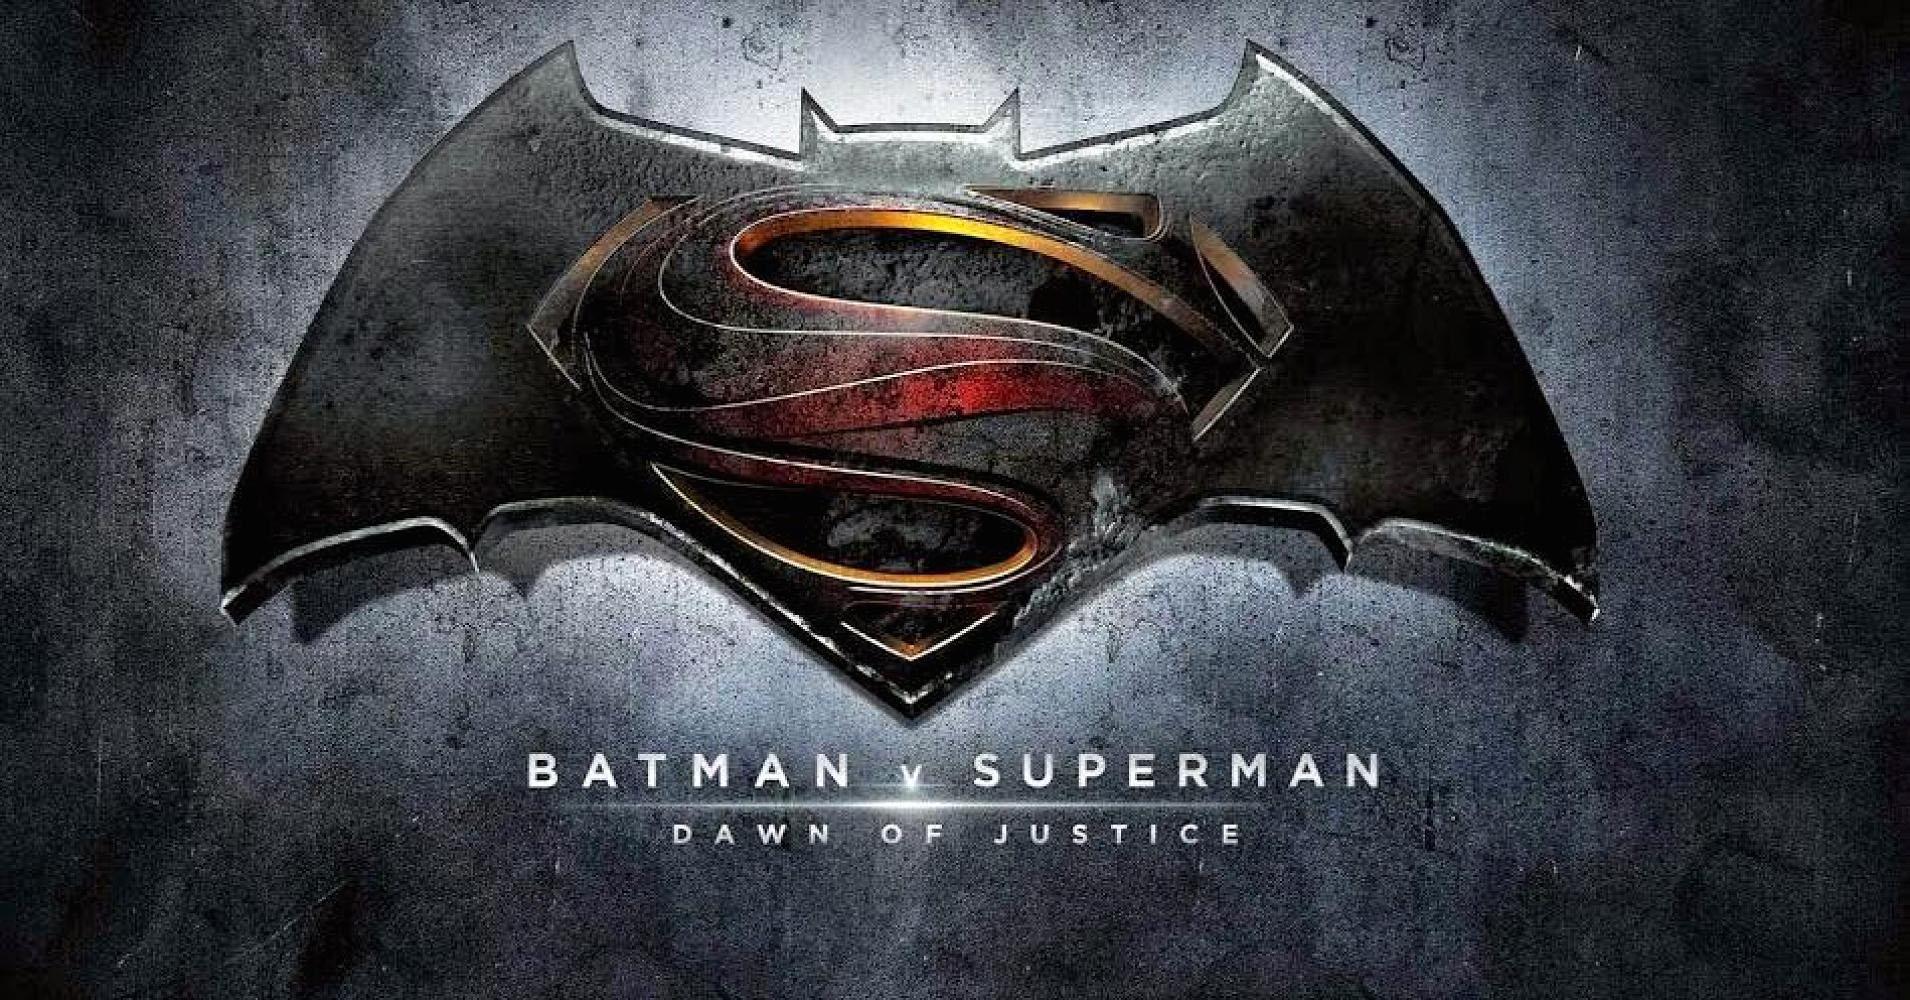 Batman V Superman, nuovi poster ufficiali